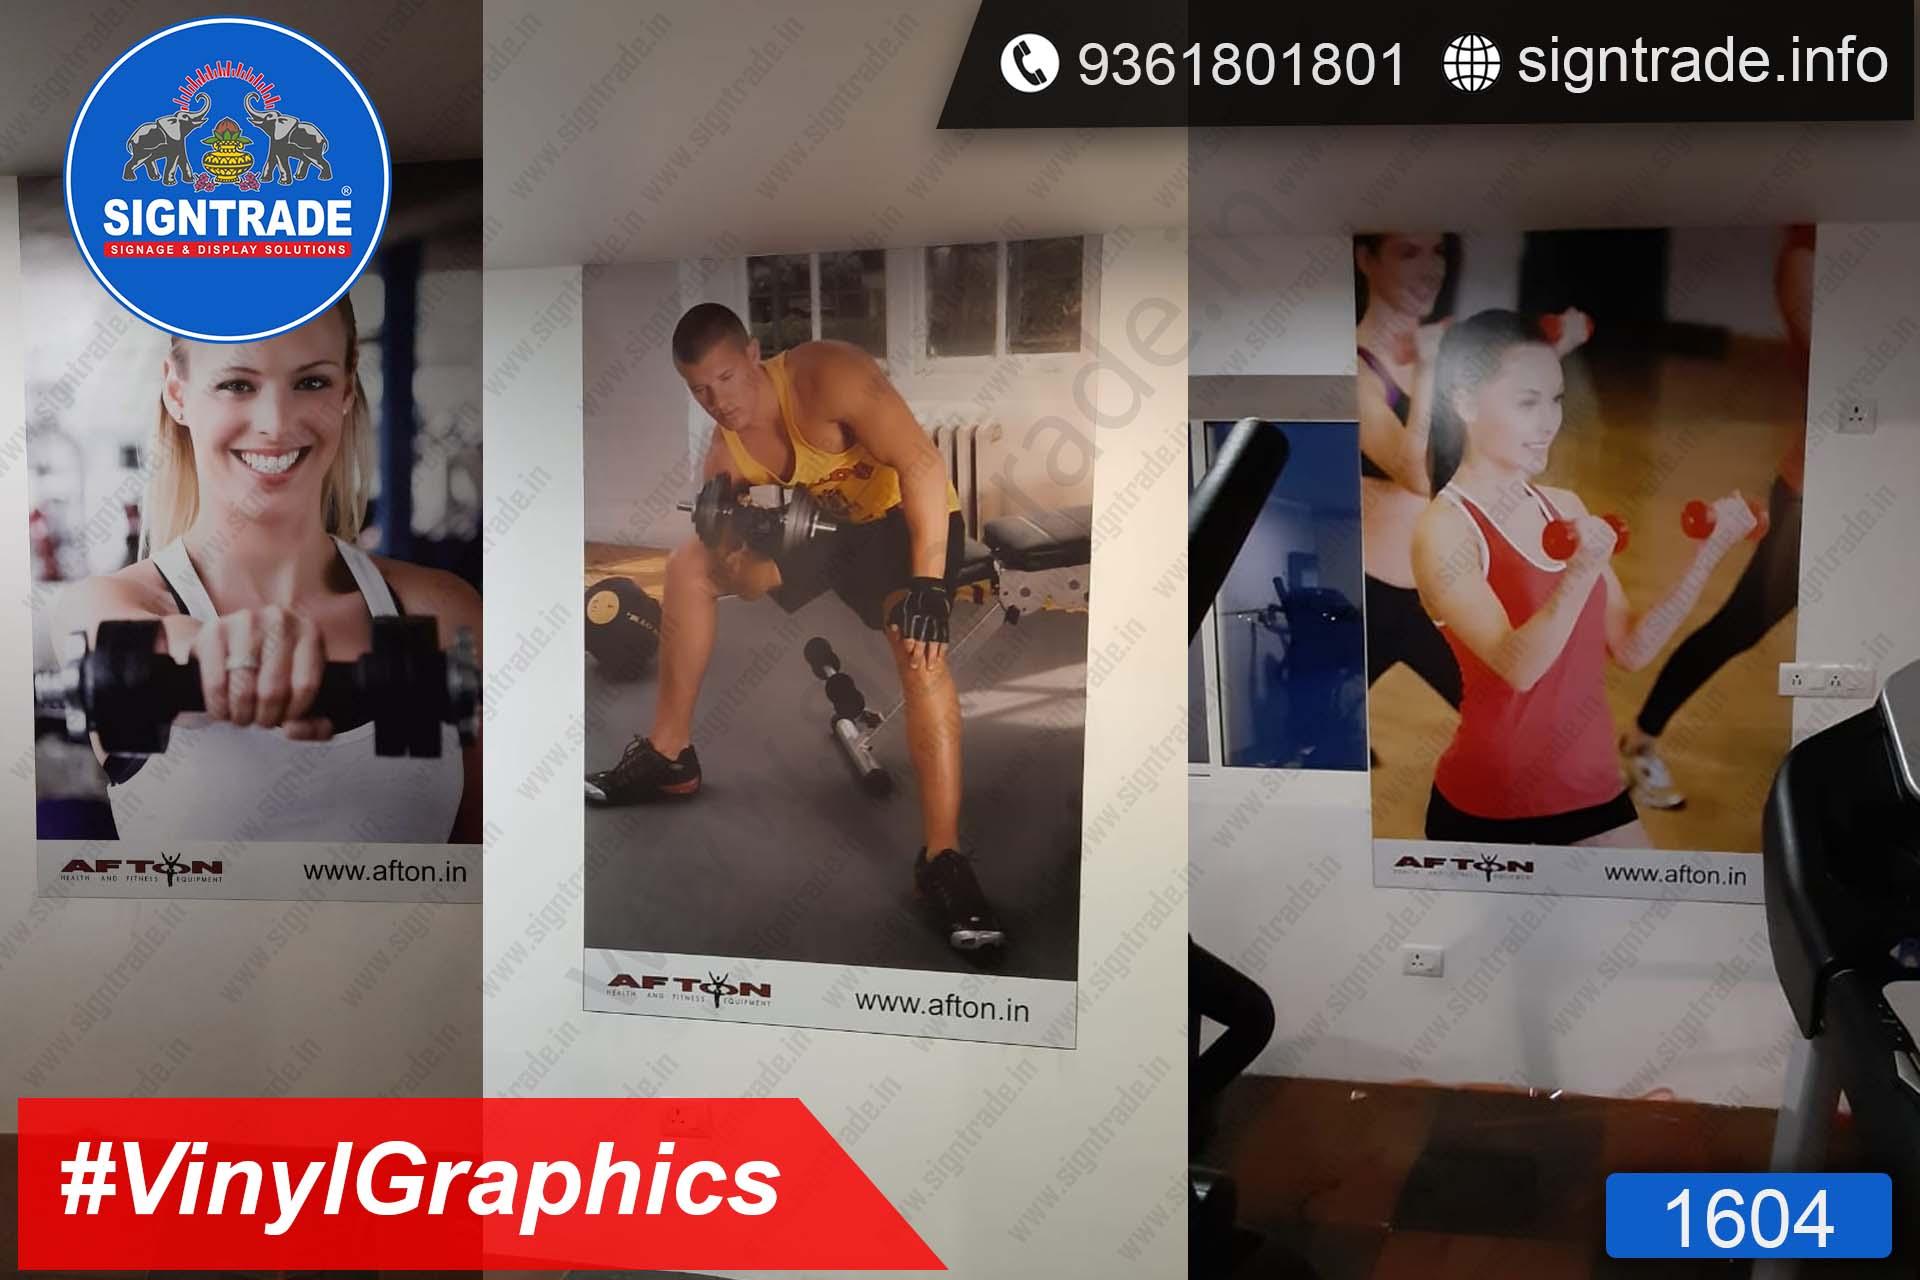 Afton, Kolapakkam, Chennai - SIGNTRADE - Wall Graphics, Vinyl Graphics, Vinyl Printing Service in Chennai